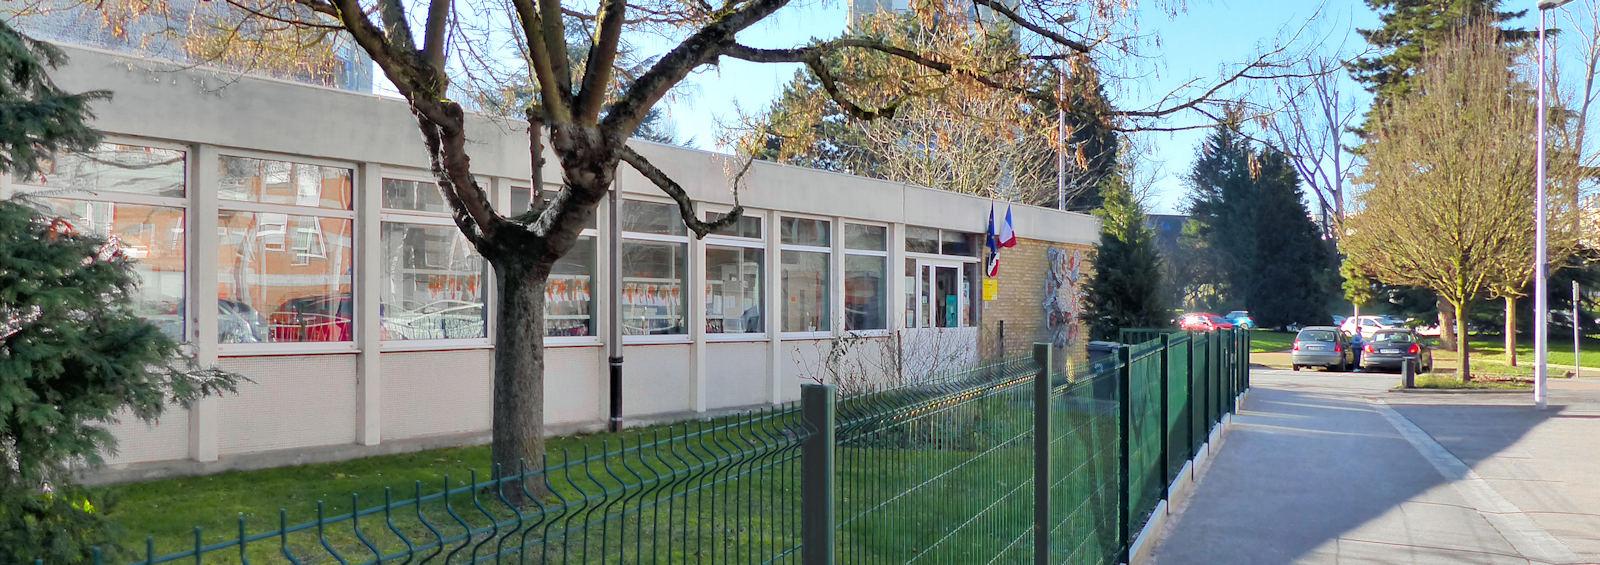 École maternelle Corneille, Tourcoing